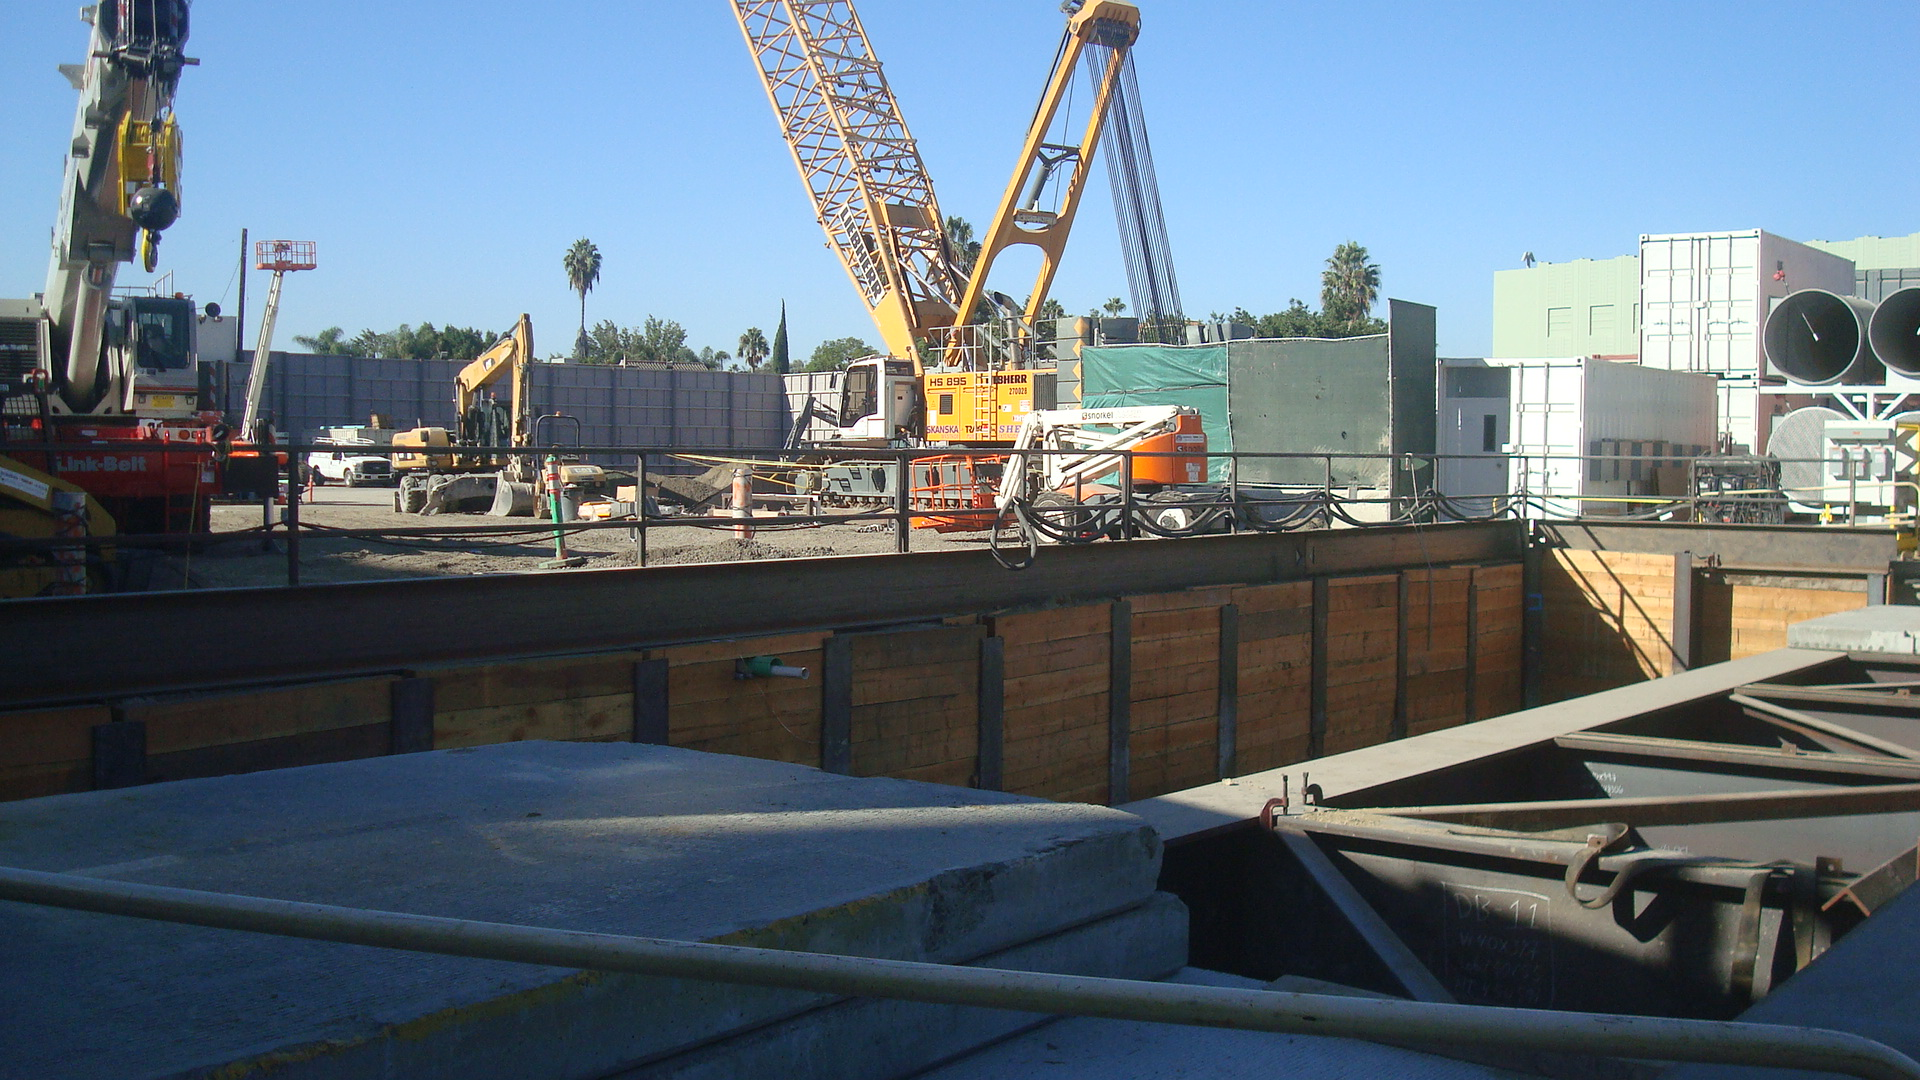 Construction site for Purple Line extension at Wilshire and La Brea.